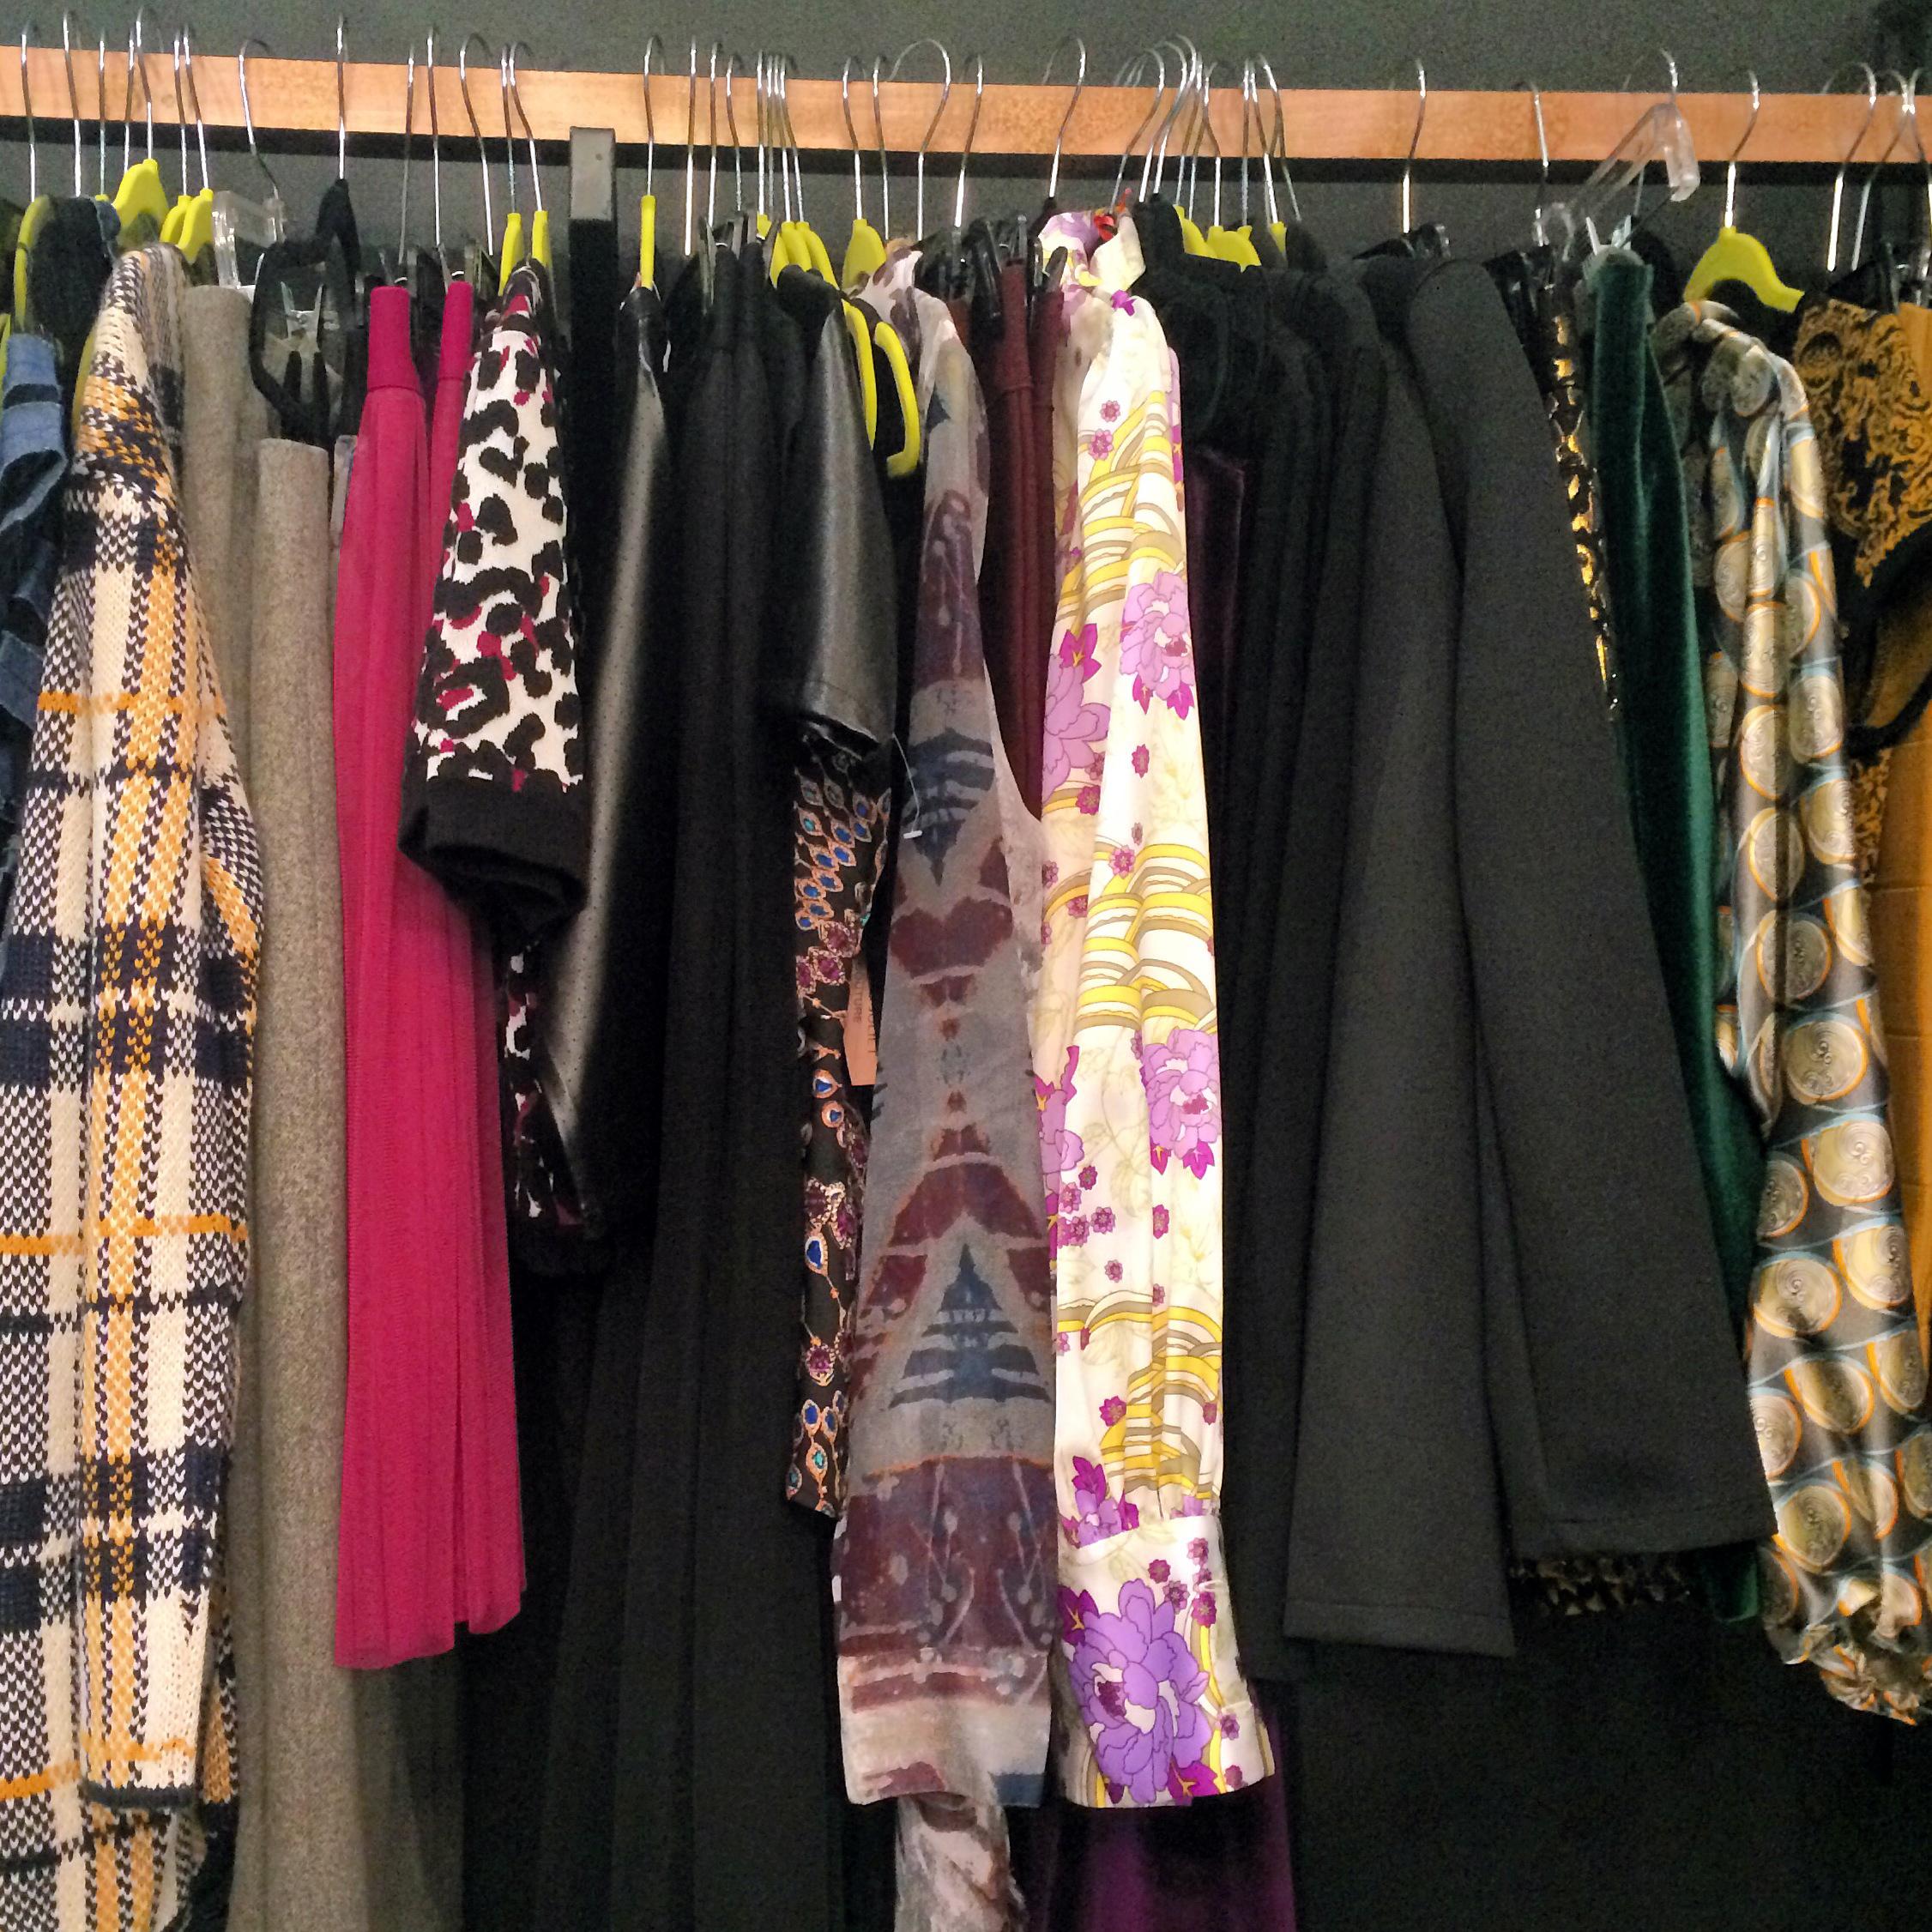 clothing on rack.jpg